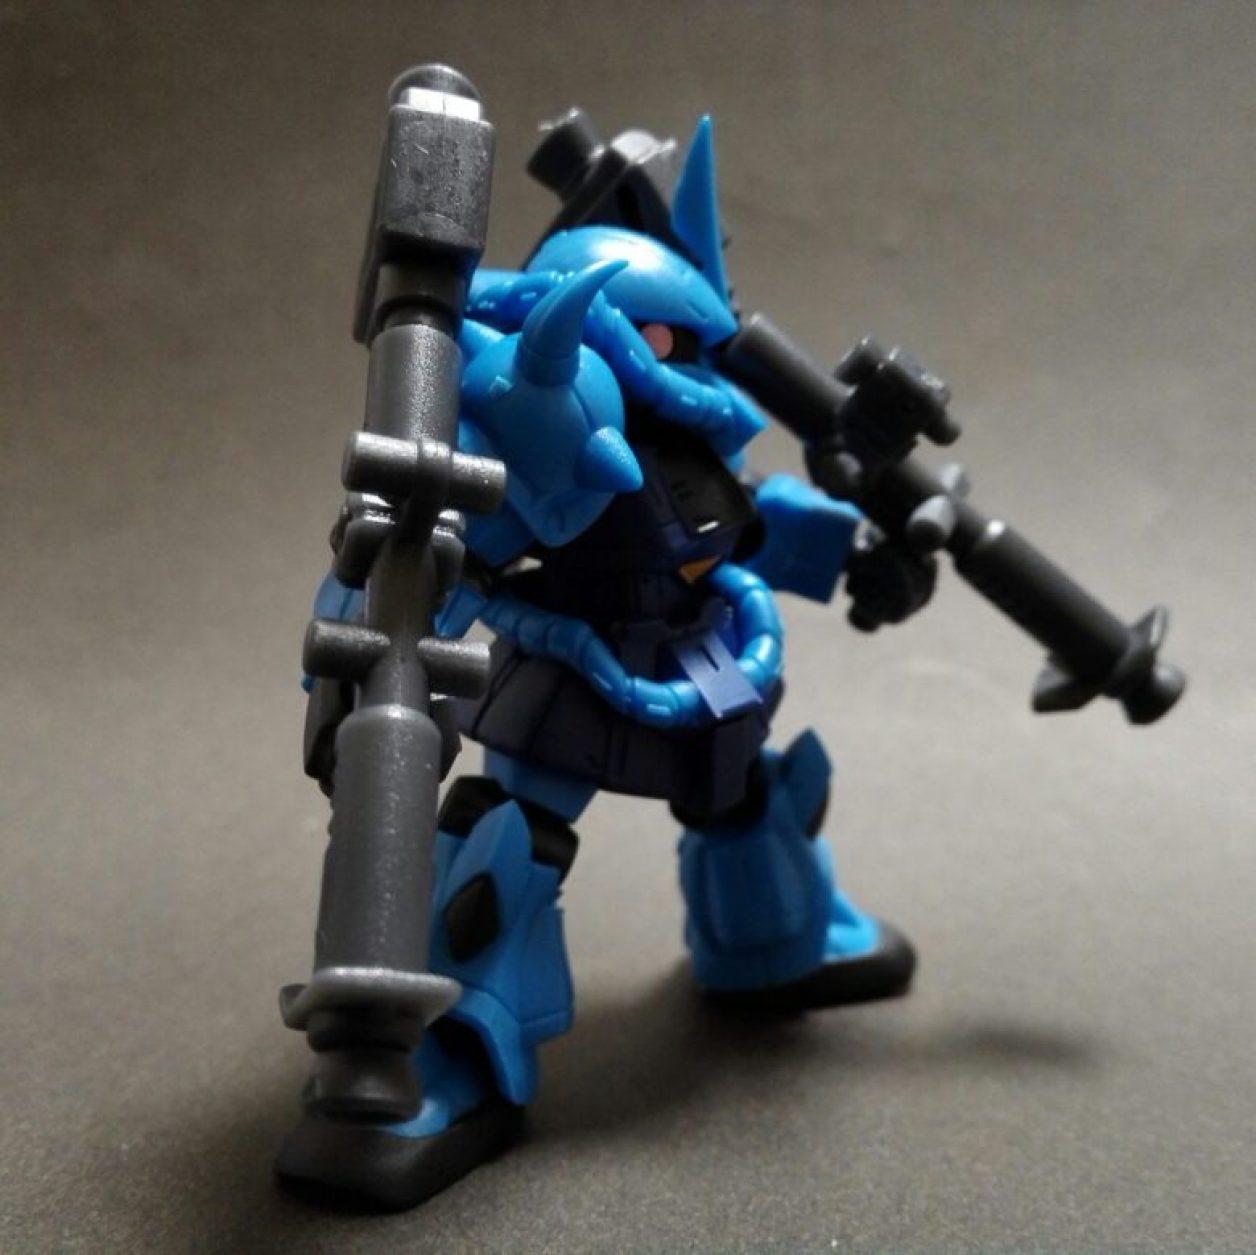 MOBILE SUIT ENSEMBLE 11弾のグフに04弾のジャイアント・バズーカII装備させた画像